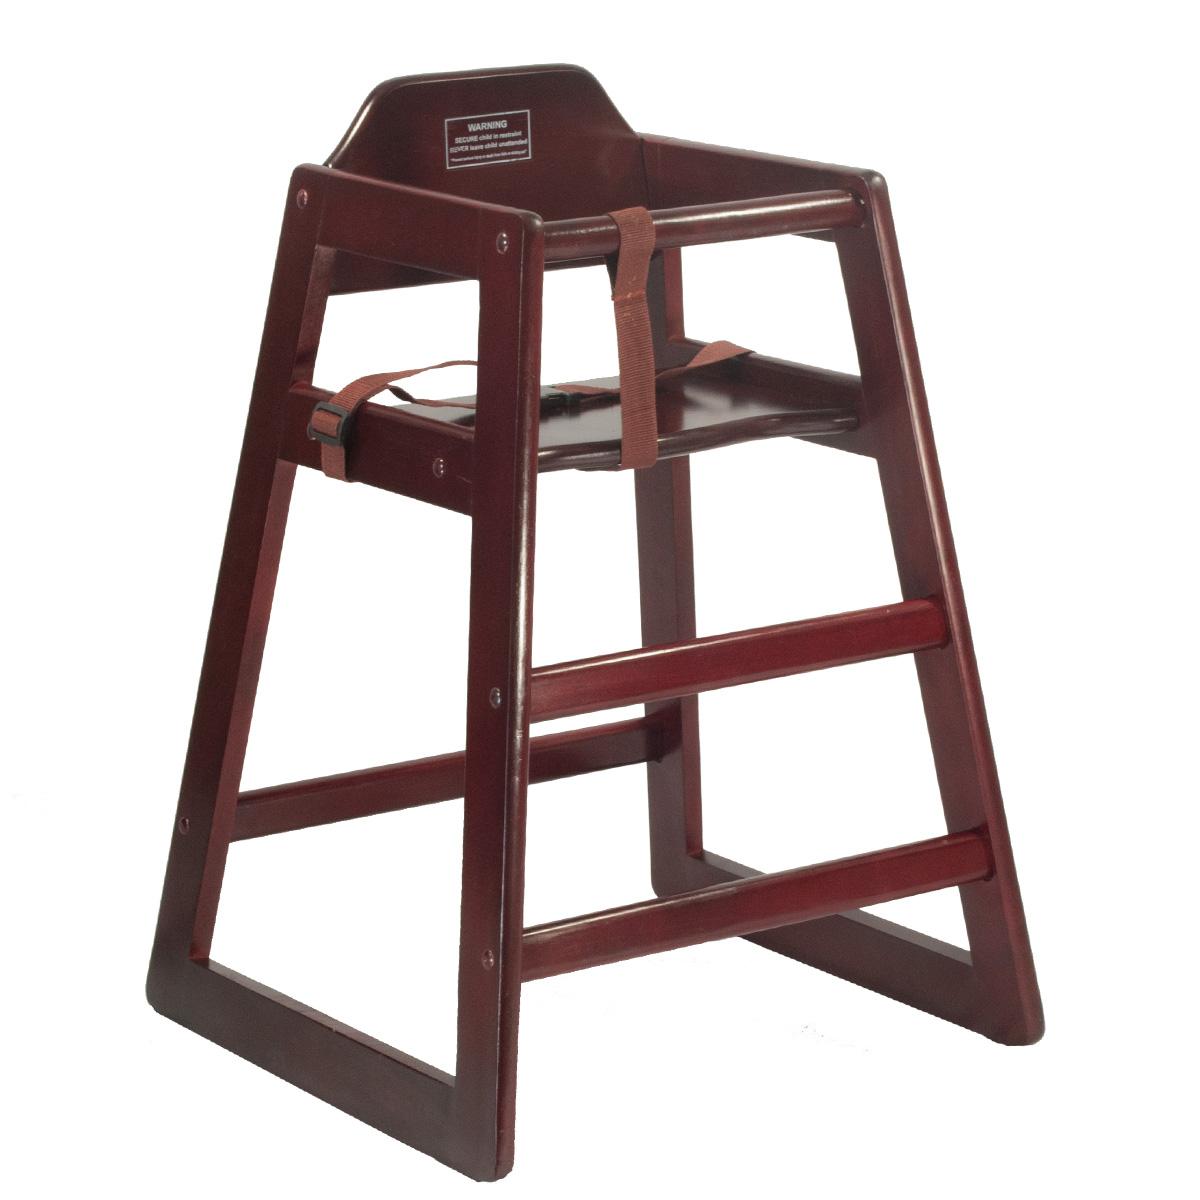 Superieur Childu0027s High Chairs U2013 Mahogany